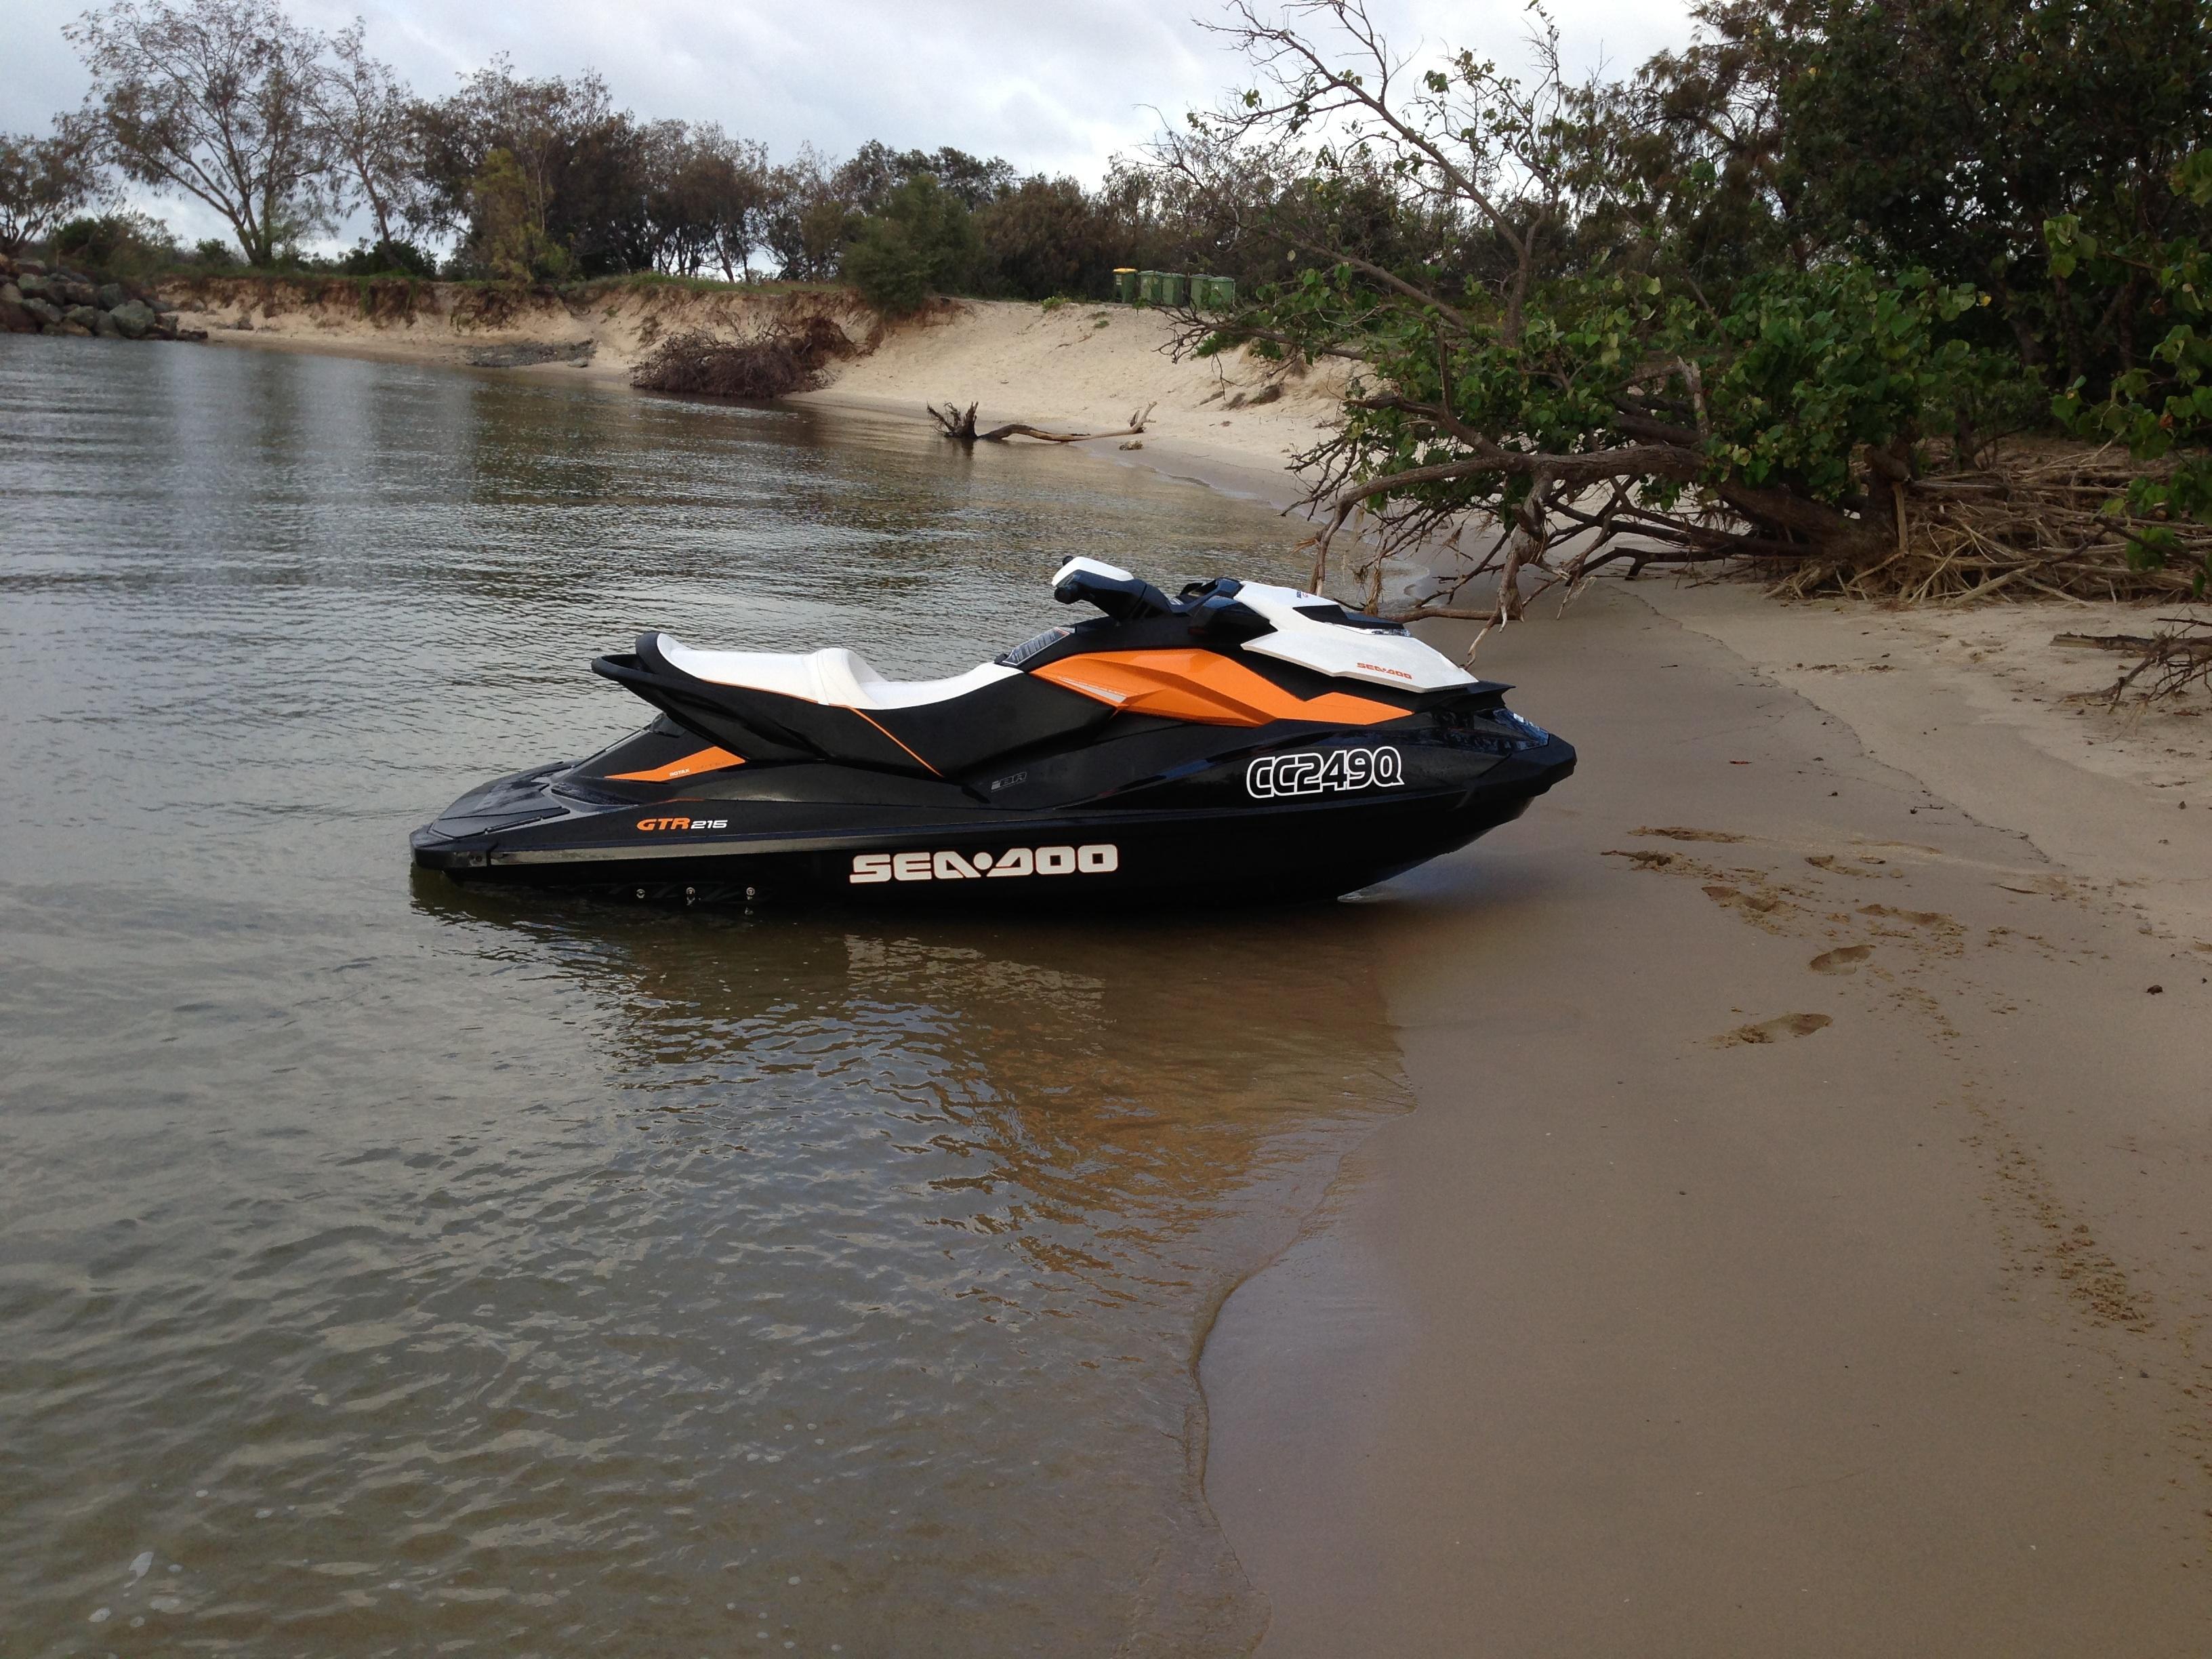 2013 Sea Doo Gtr 215 My12 Boat Sales Qld Gold Coast